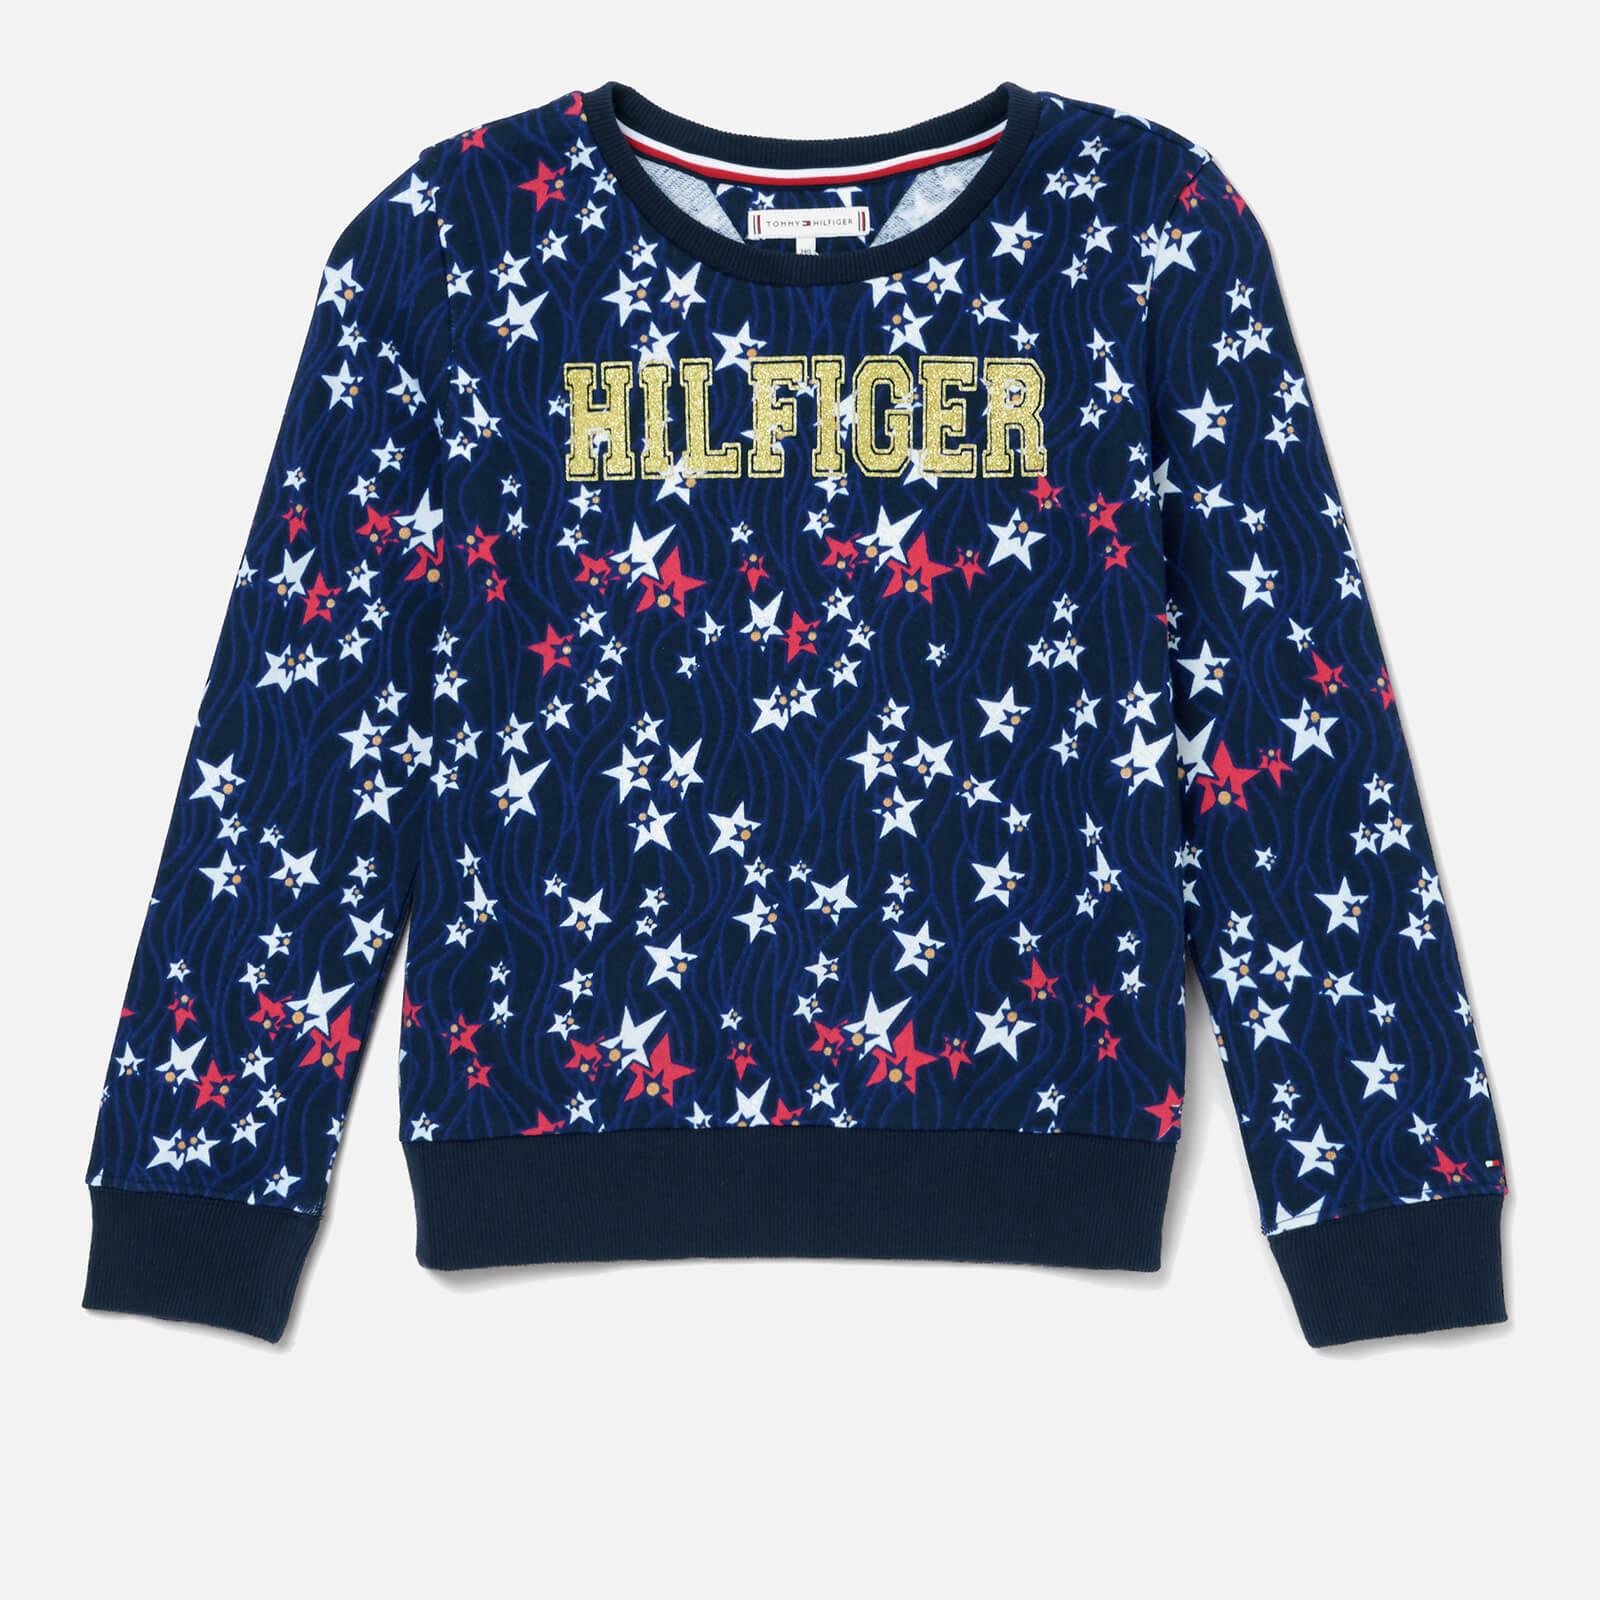 Tommy Hilfiger Girls' Flowing Stars Sweatshirt - Black Iris/Multi - 16 Years - Multi